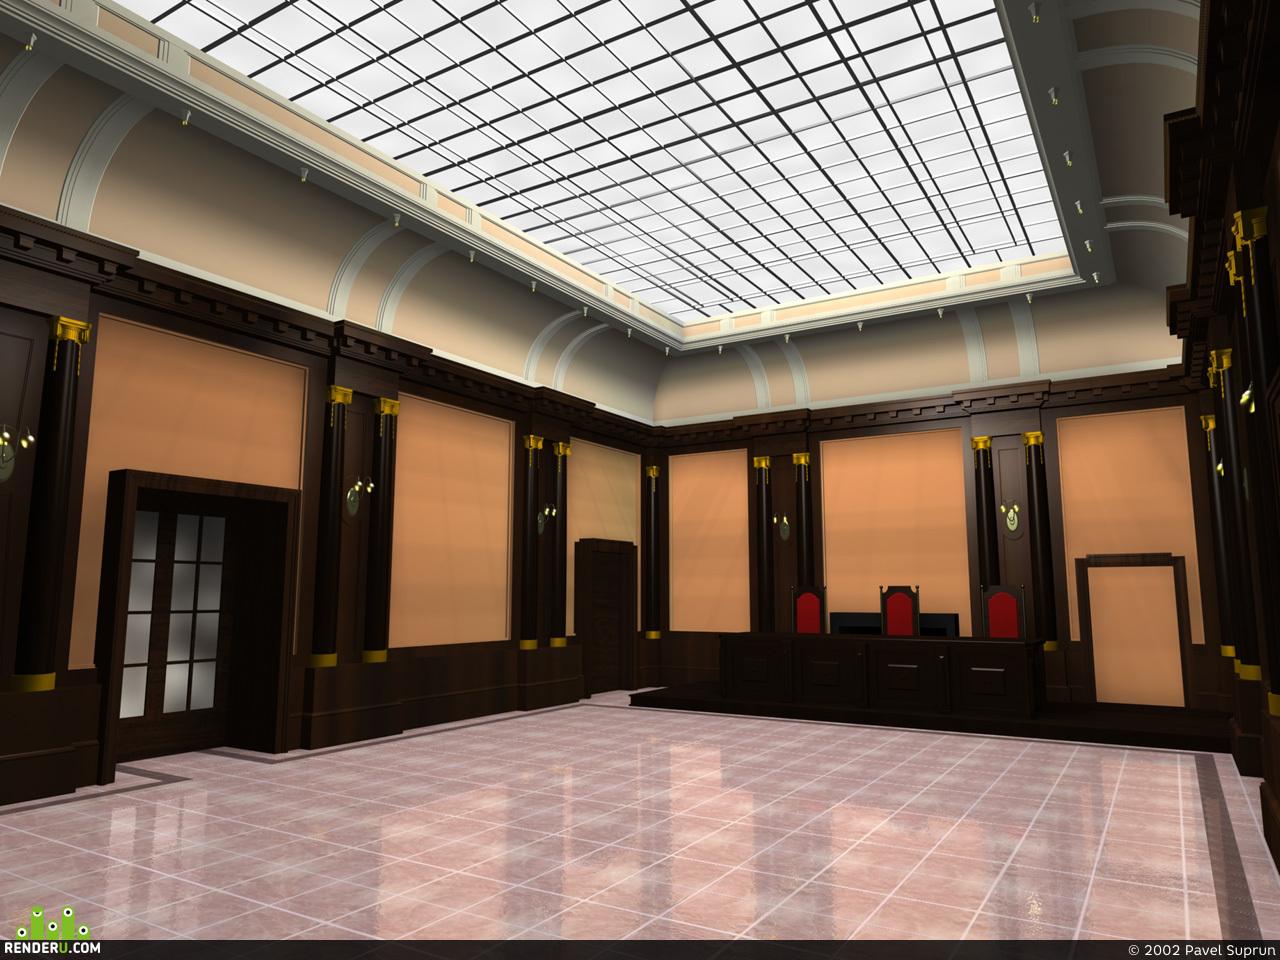 preview Зал судебных заседаний. Реконструкция.